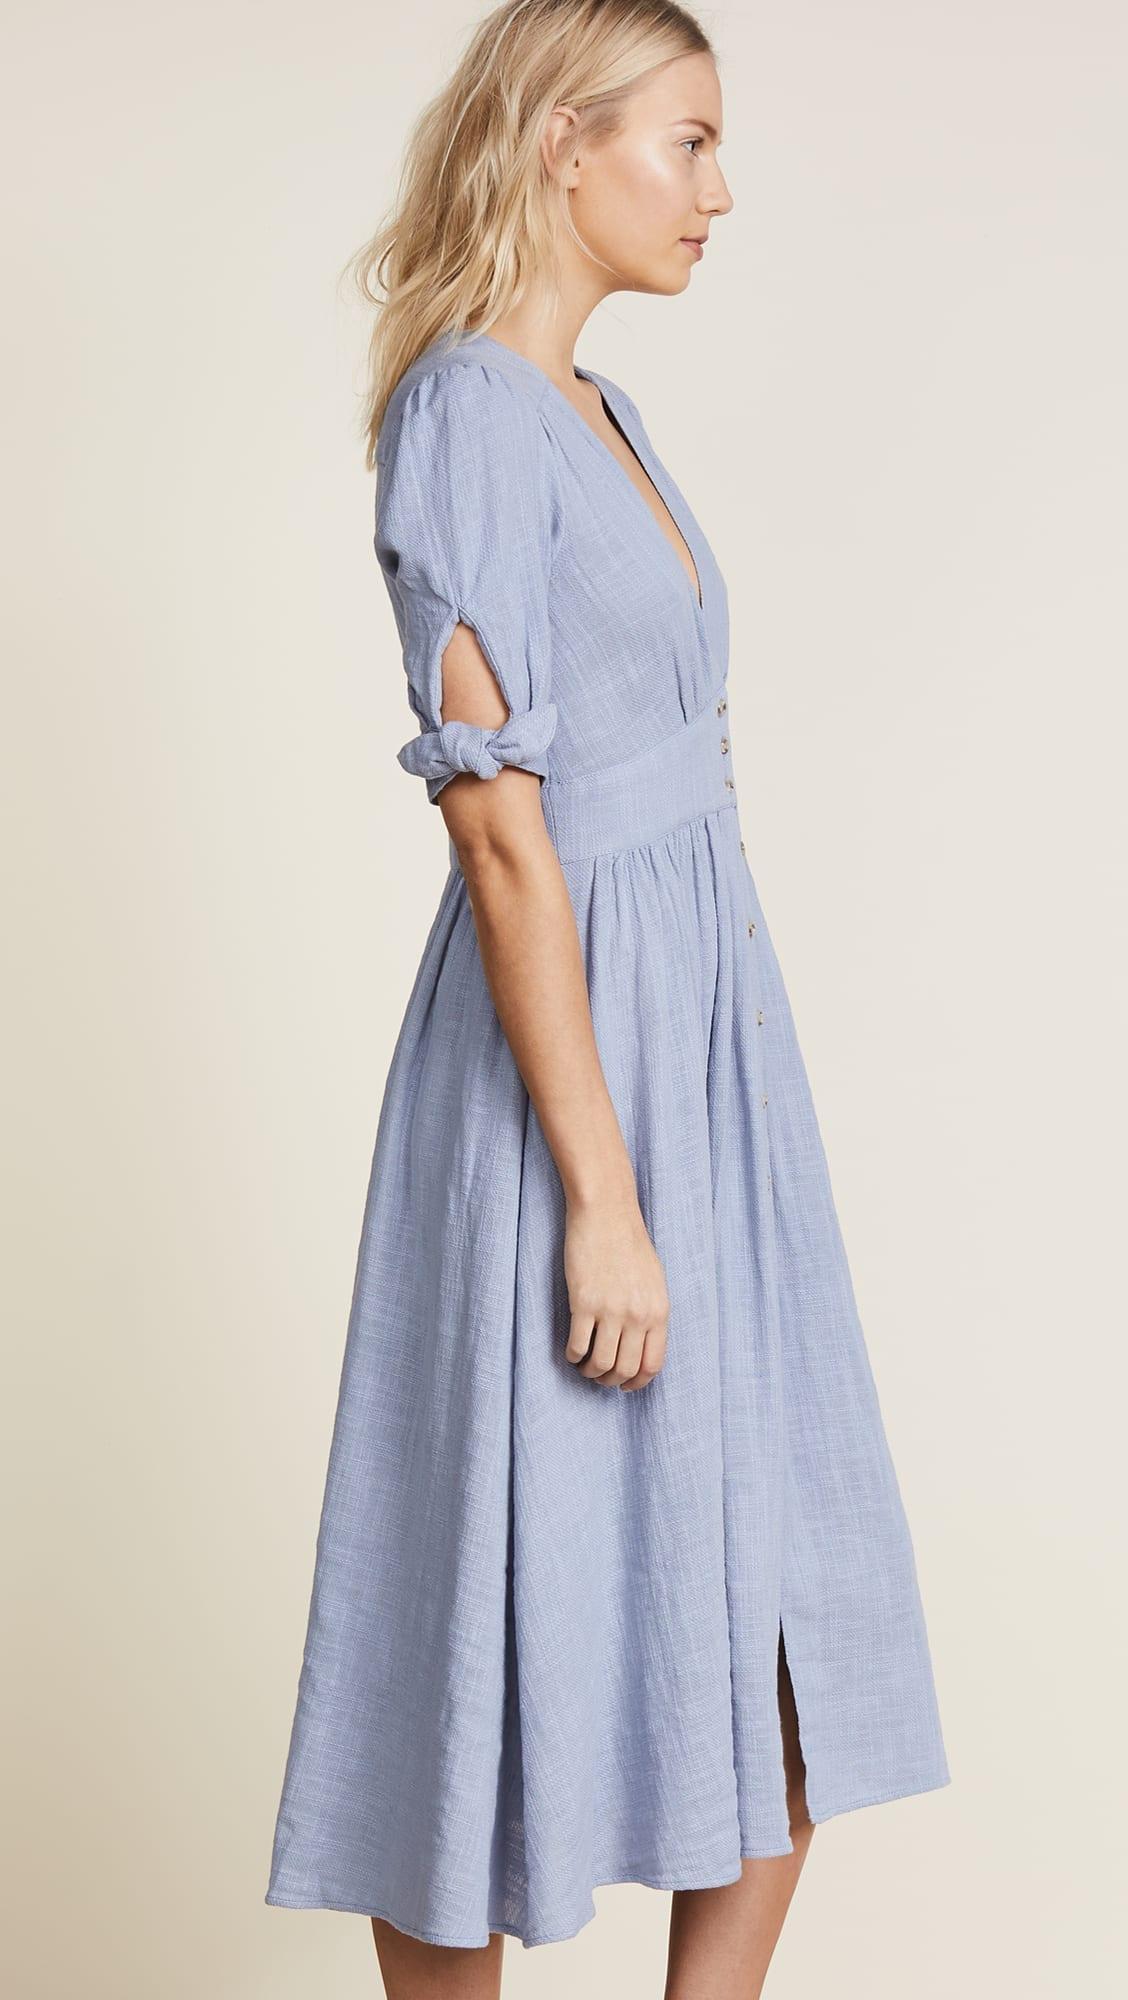 FREE PEOPLE Love of My Life Blue Dress